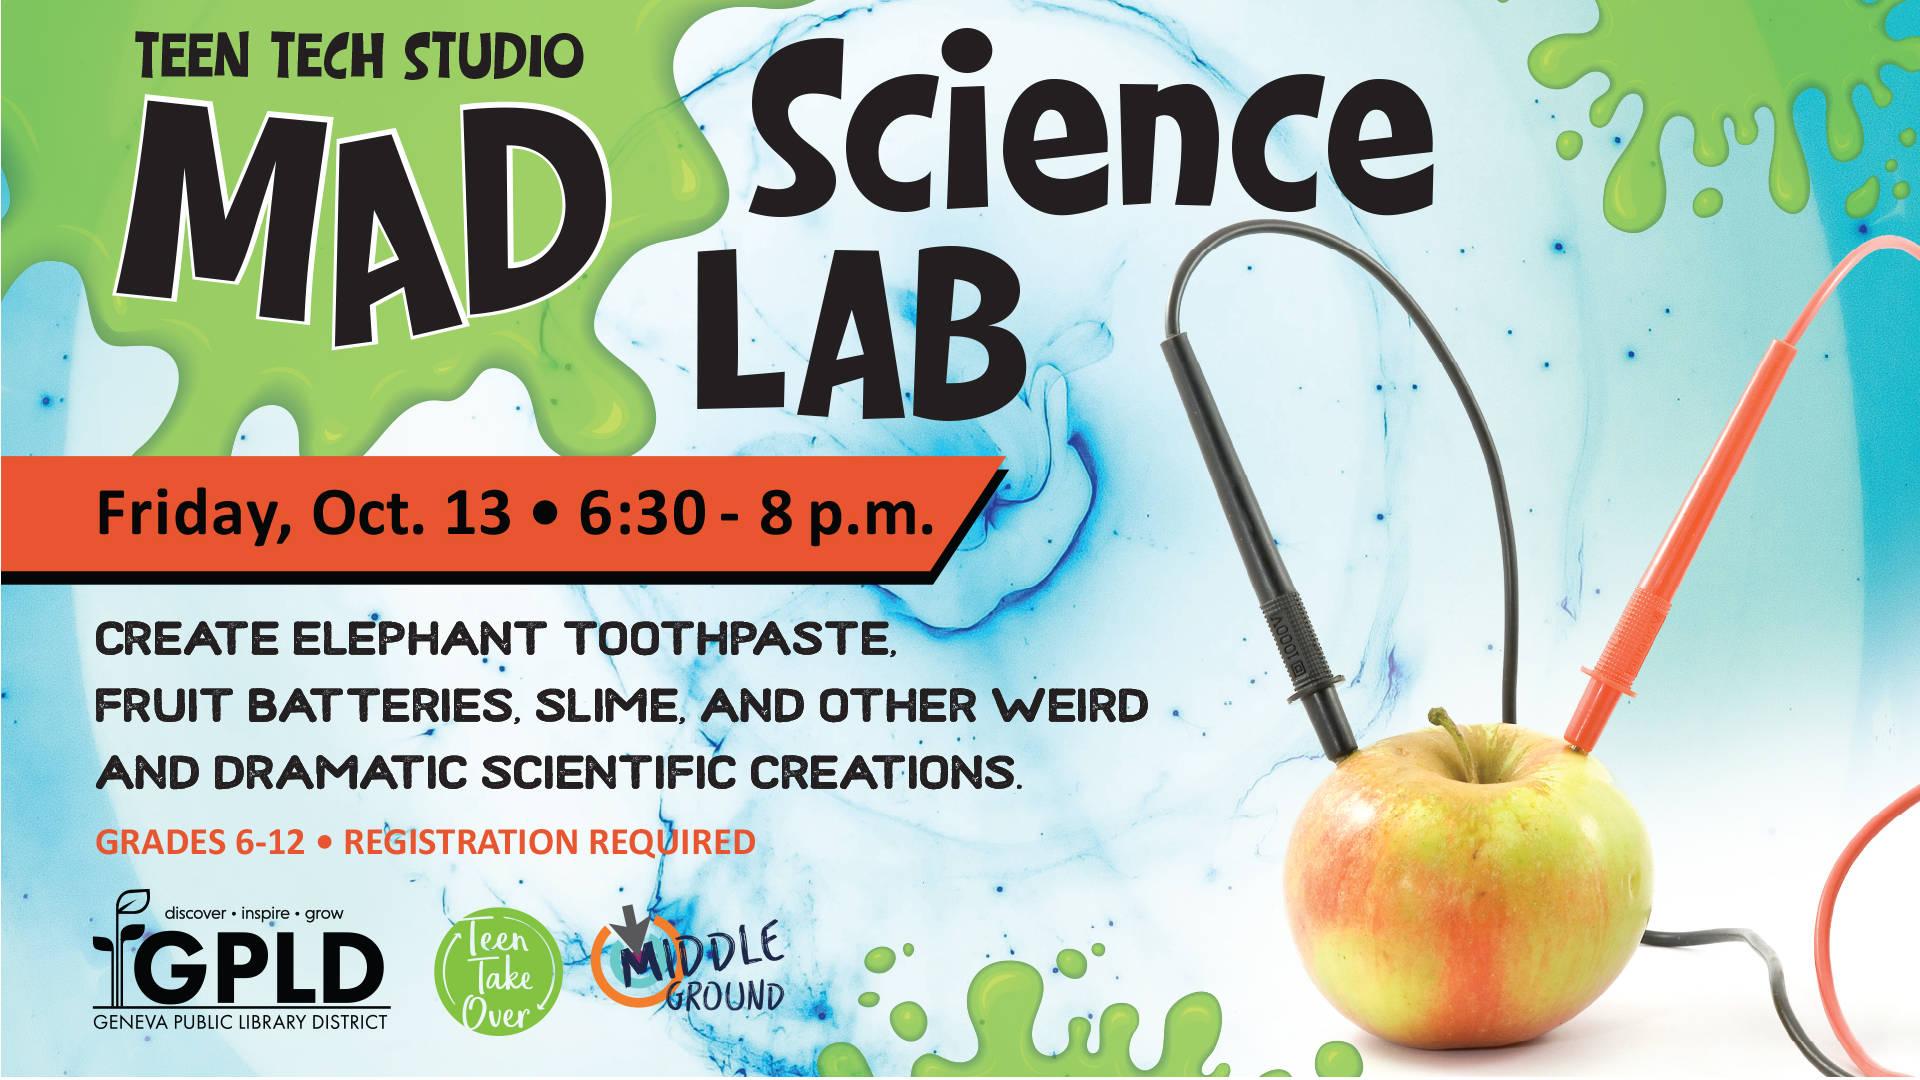 Teen Tech Studio Mad Science Lab   Geneva Public Library 1920x1080